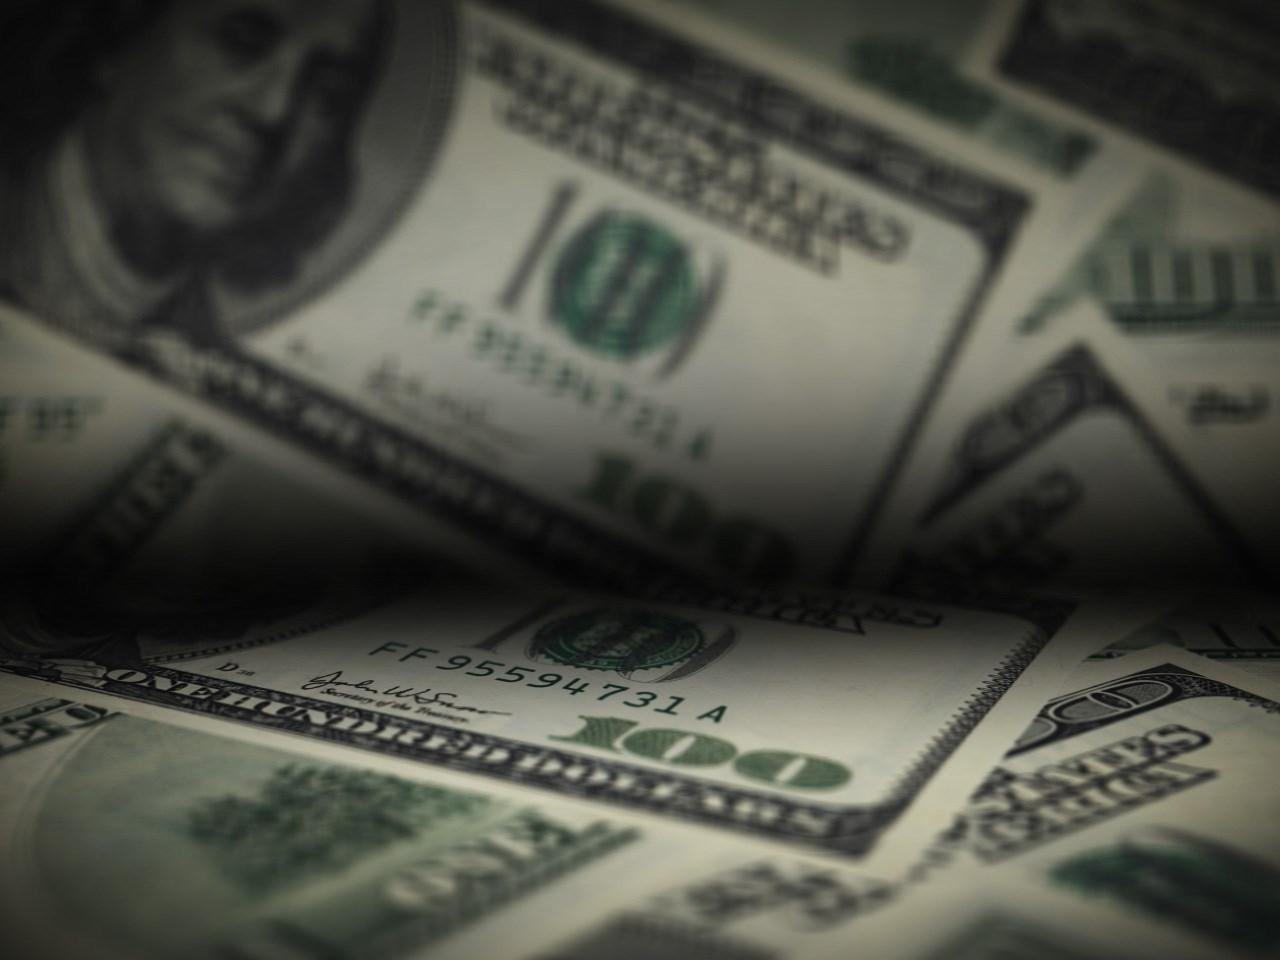 money, counterfeit_1492537928211.jpg